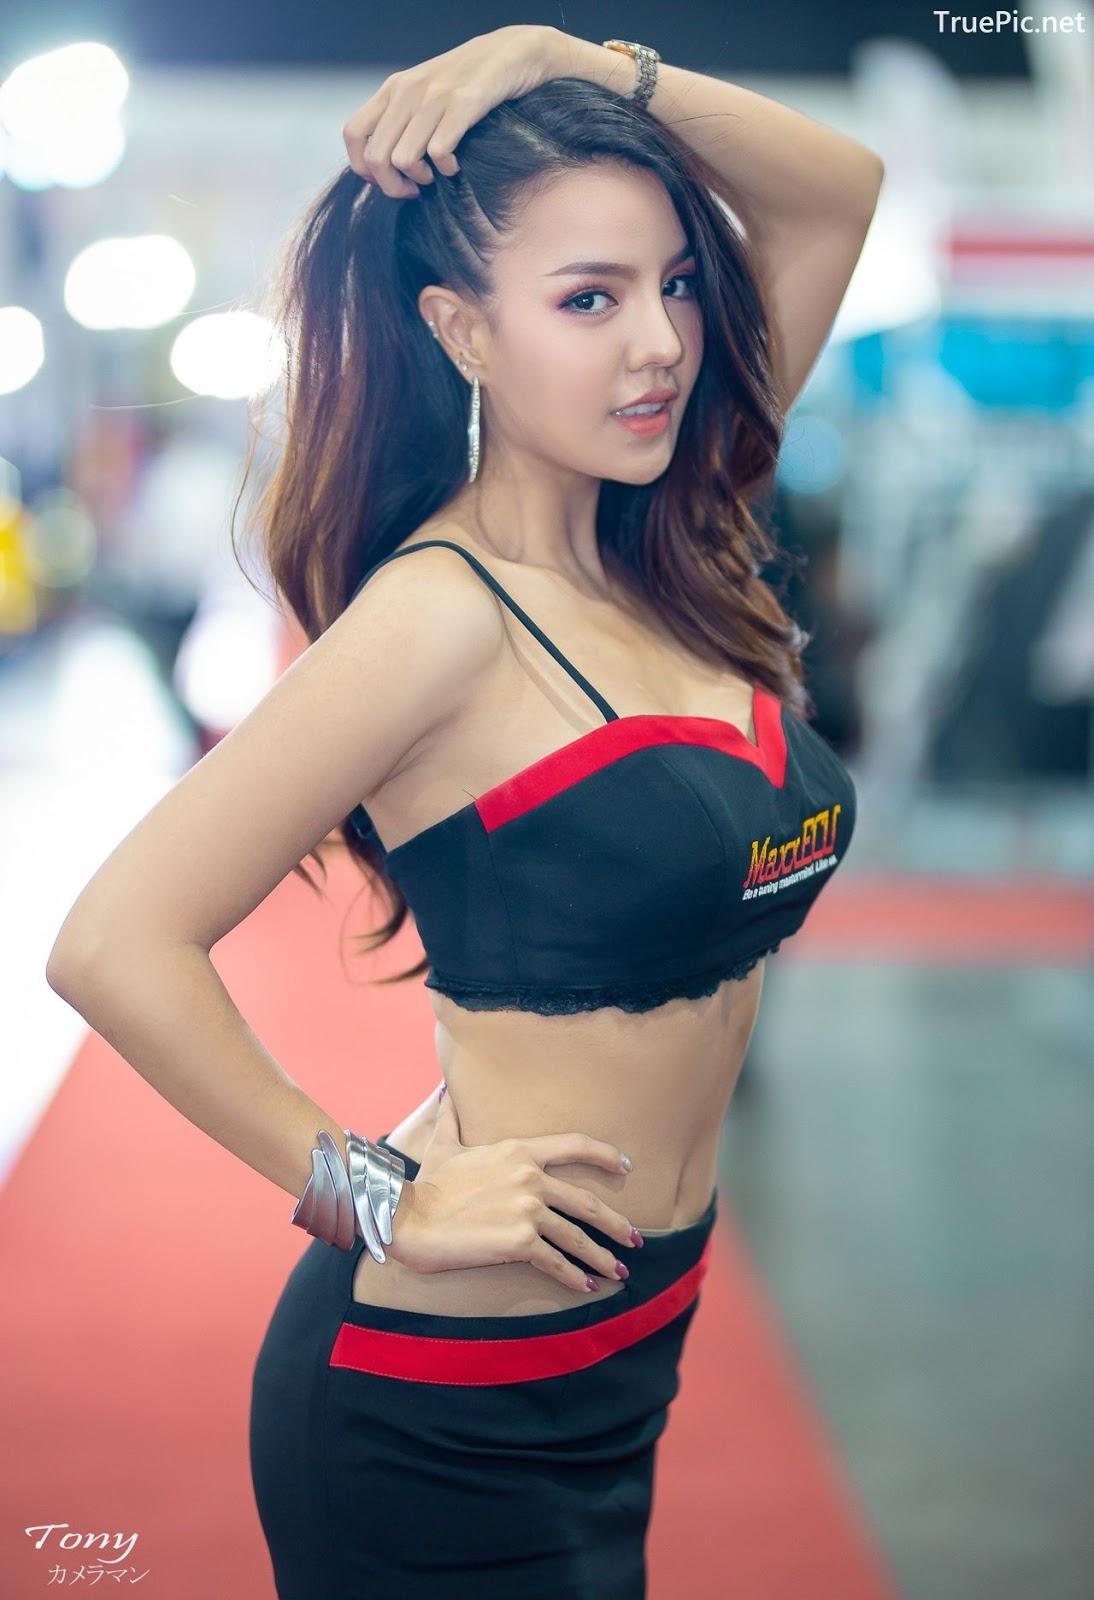 Image-Thailand-Hot-Model-Thai-Racing-Girl-At-Bangkok-Auto-Salon-2019-TruePic.net- Picture-10